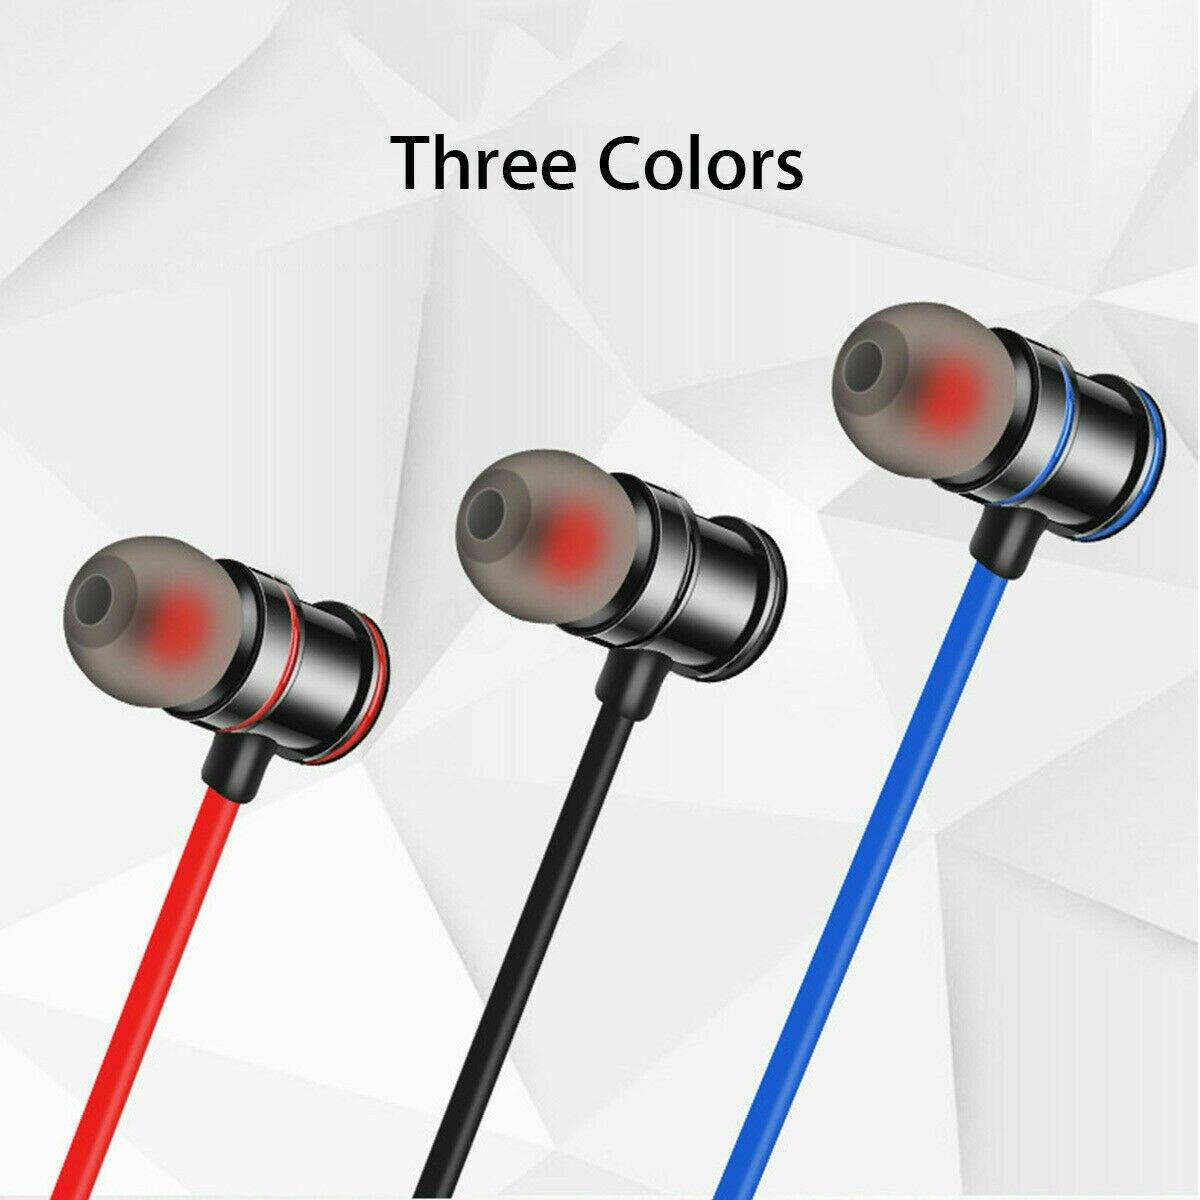 Bluetooth 5 0 Headset Tws Wireless Earphones Mini Earbud Stereo Headphones Ipx5 In Bluetooth Earphones Headphones From Consumer Electronics On Aliexpress